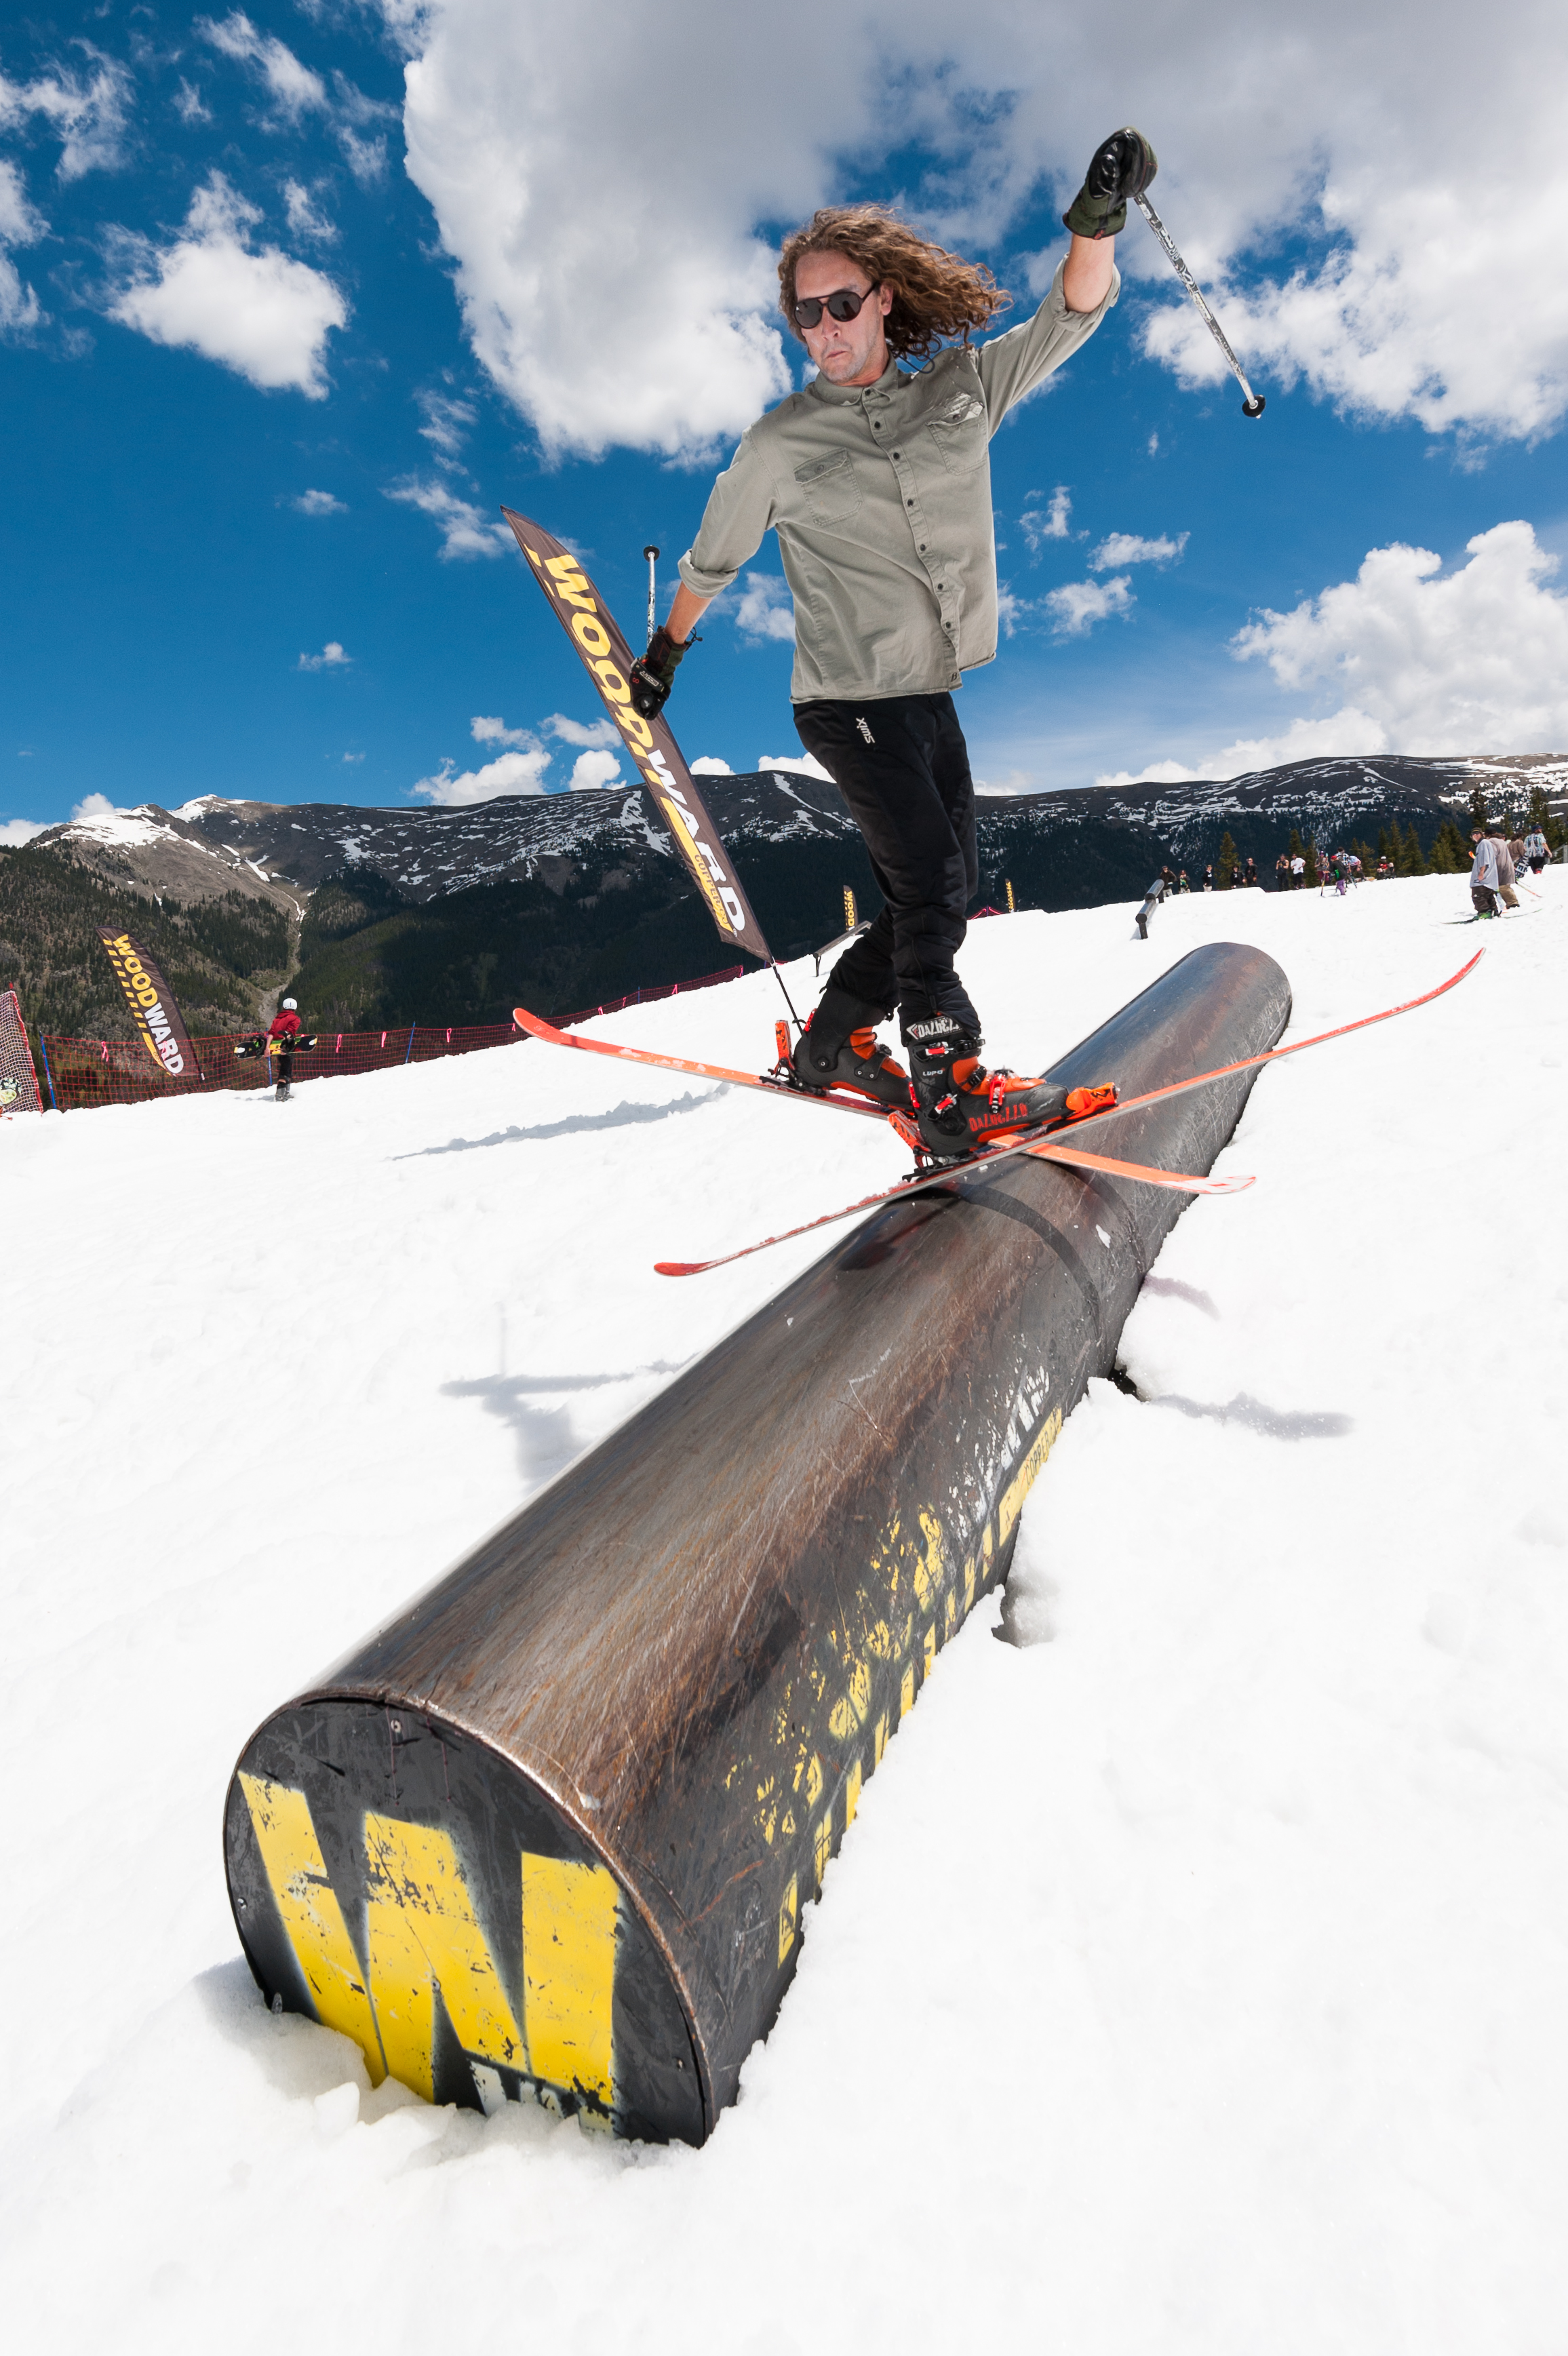 W2_2015_ski_JoeyNormandeau_DaffySlide_Pavilion_Weaver.jpg